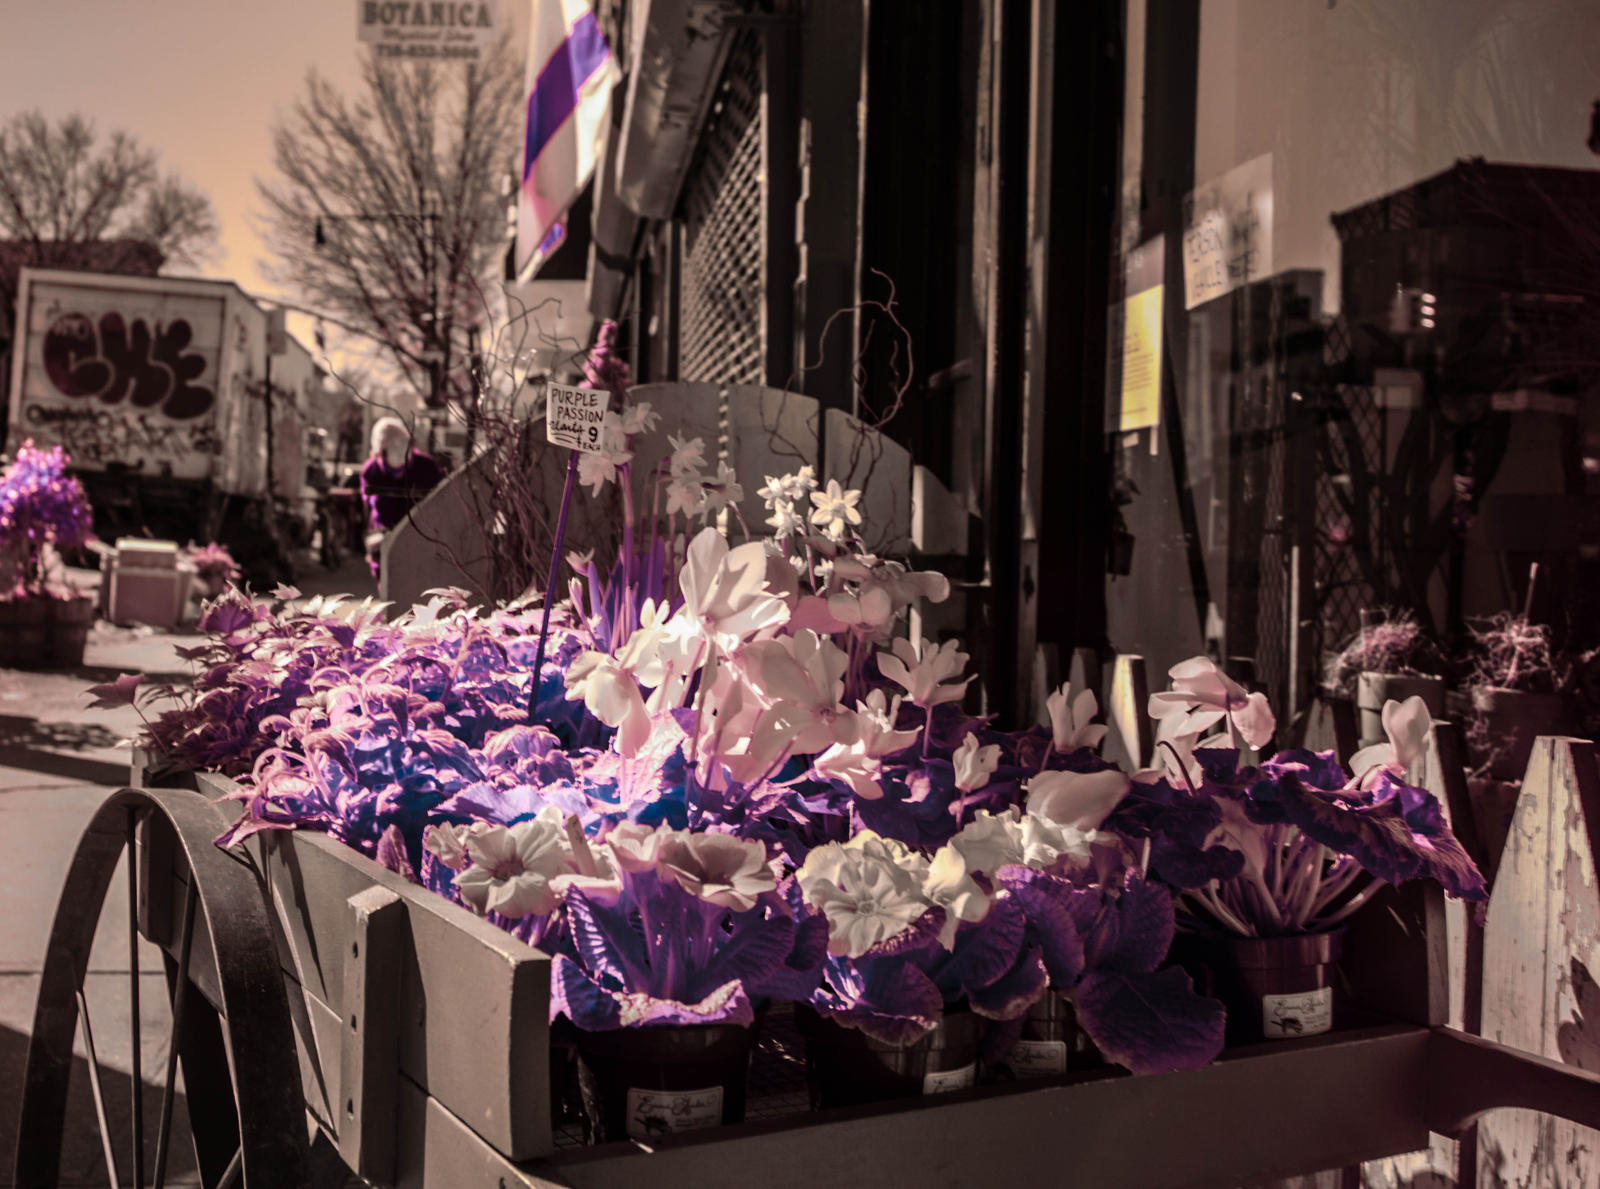 Purple Passion by FennecFoxen